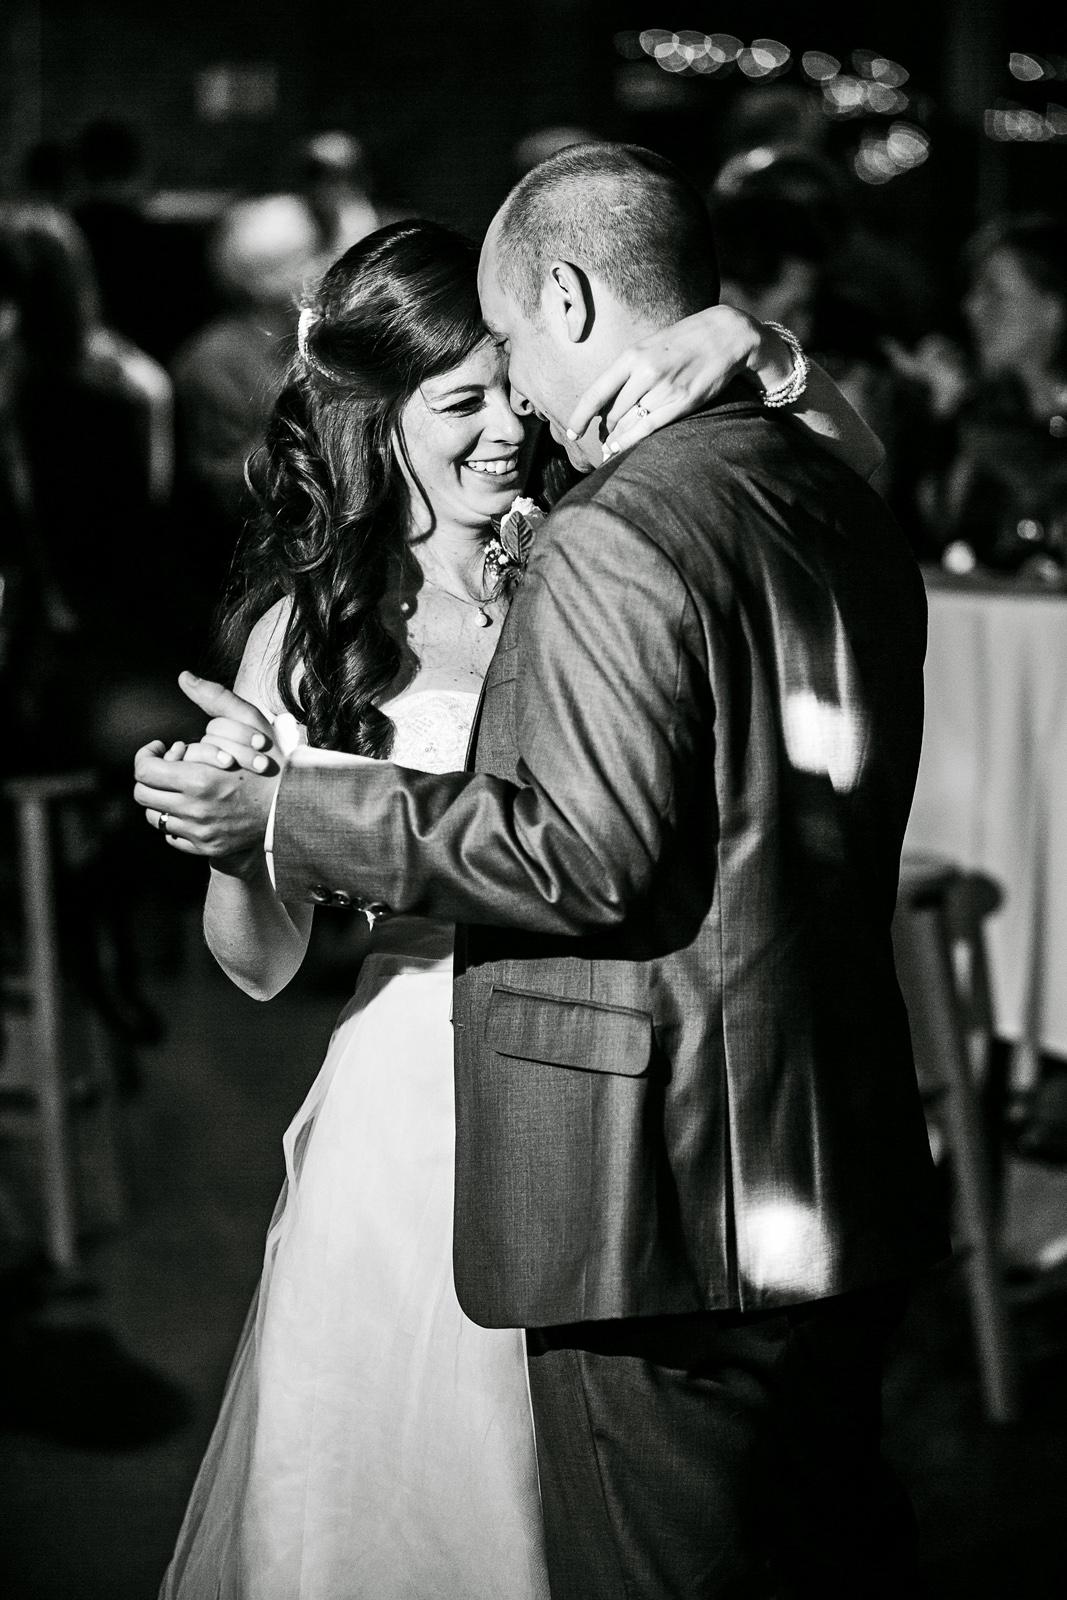 Oldani-Photography-St-Louis-Film-photographer-Schlafly-Tap-Room-Wedding-Reception_20140927_19403559.jpg